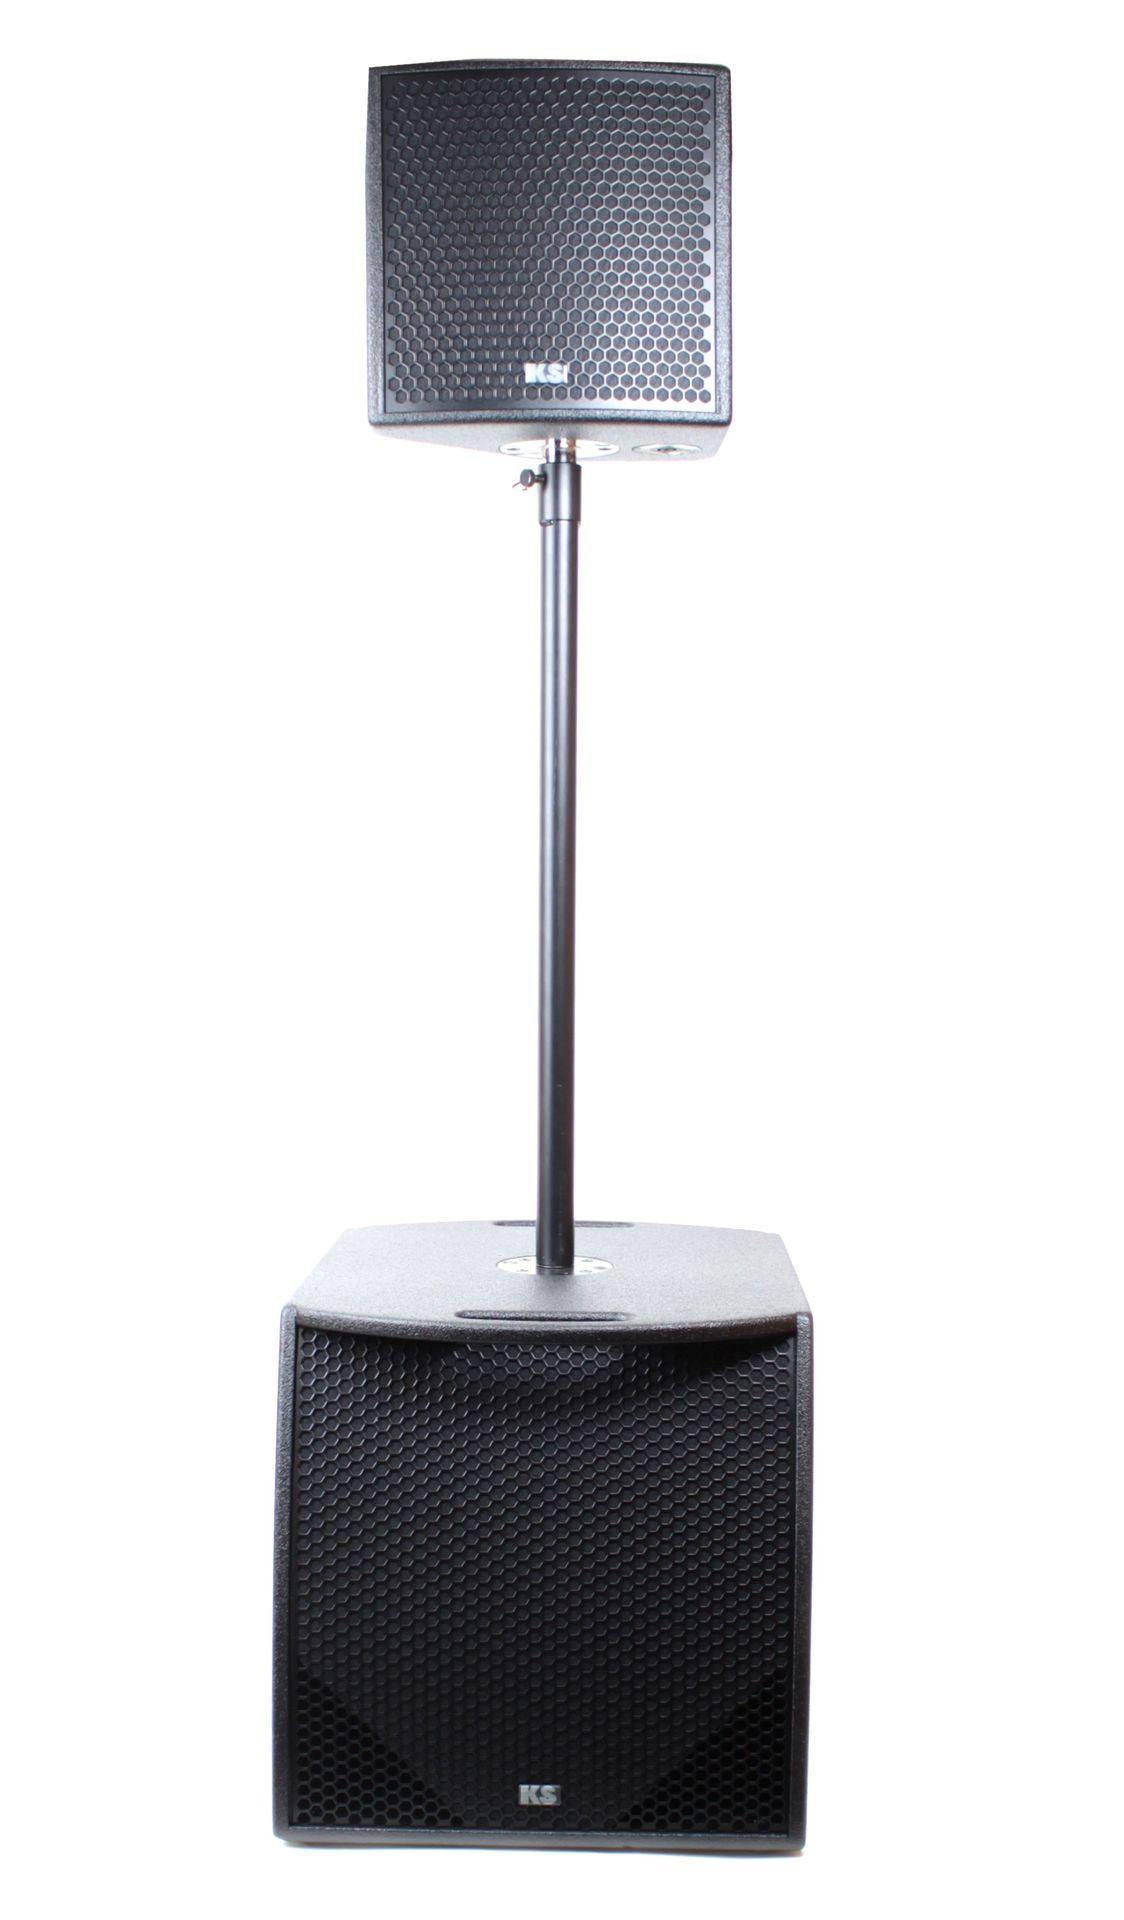 KS Audio MicroSat 2 Aktives Lautsprechersystem 3-Wege  NEU